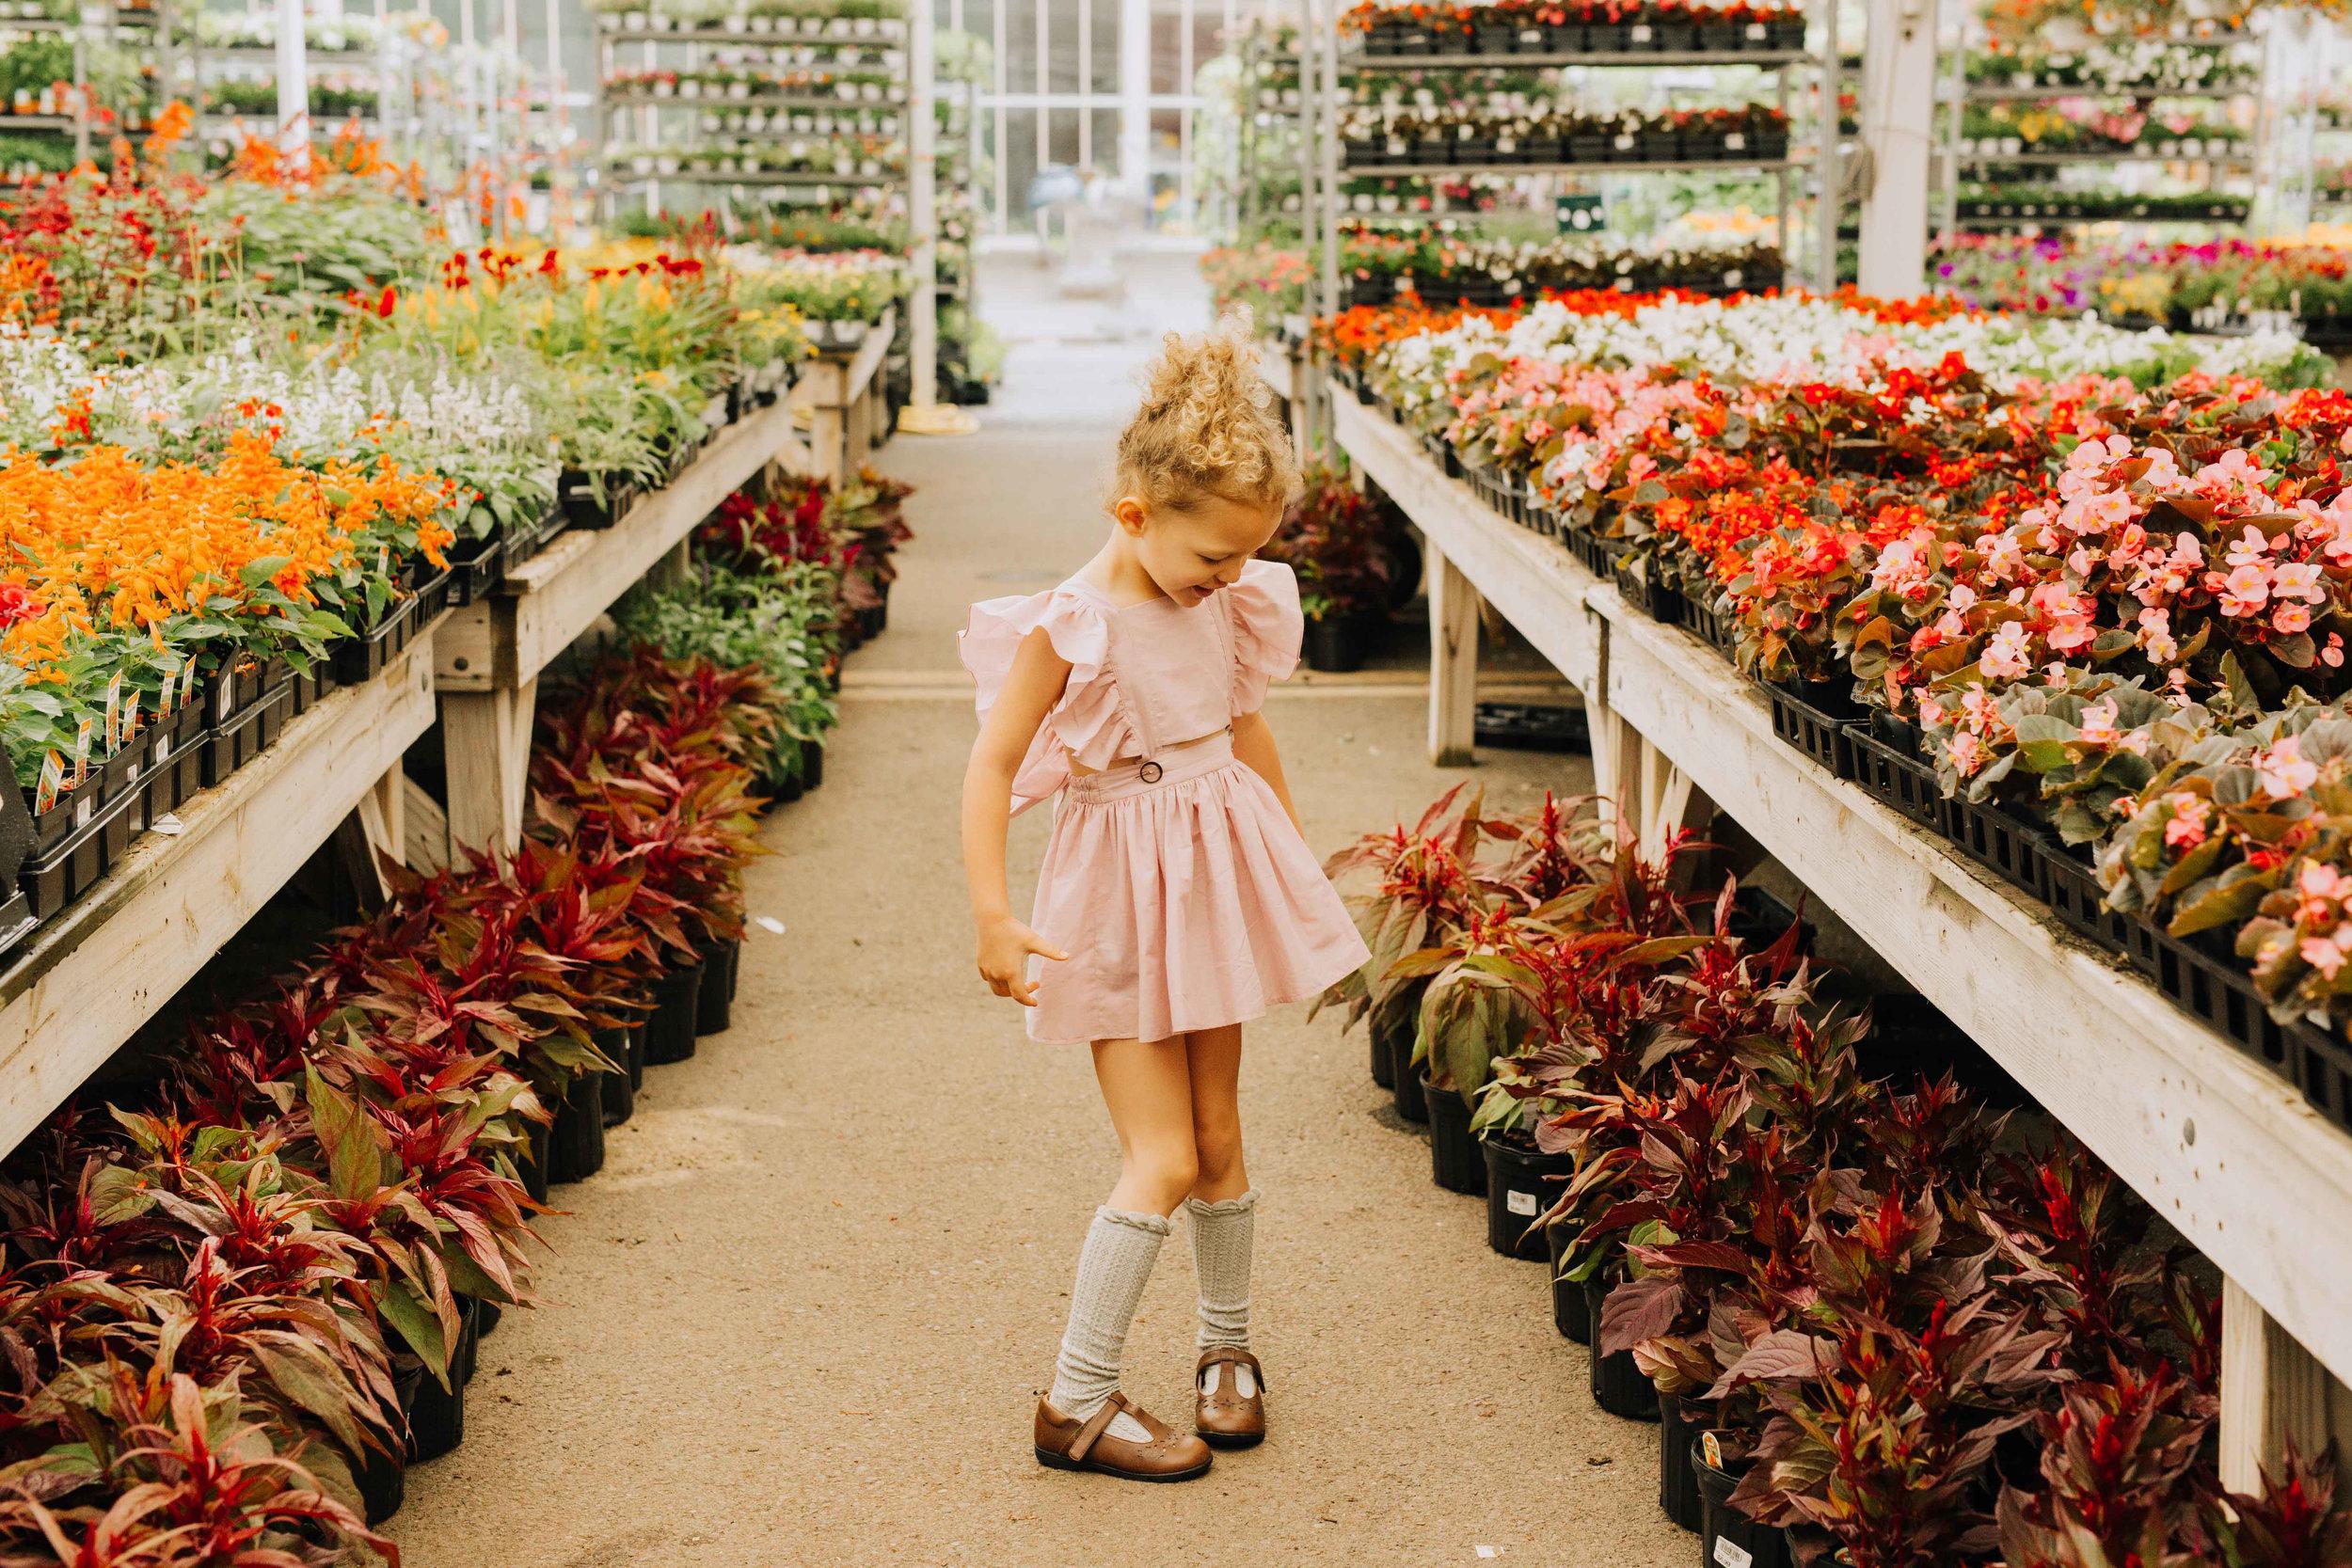 Merrifield-garden-greenhouse-indoor-Jacqueline-Waters-Photography-Red-dress-family- (245).jpg